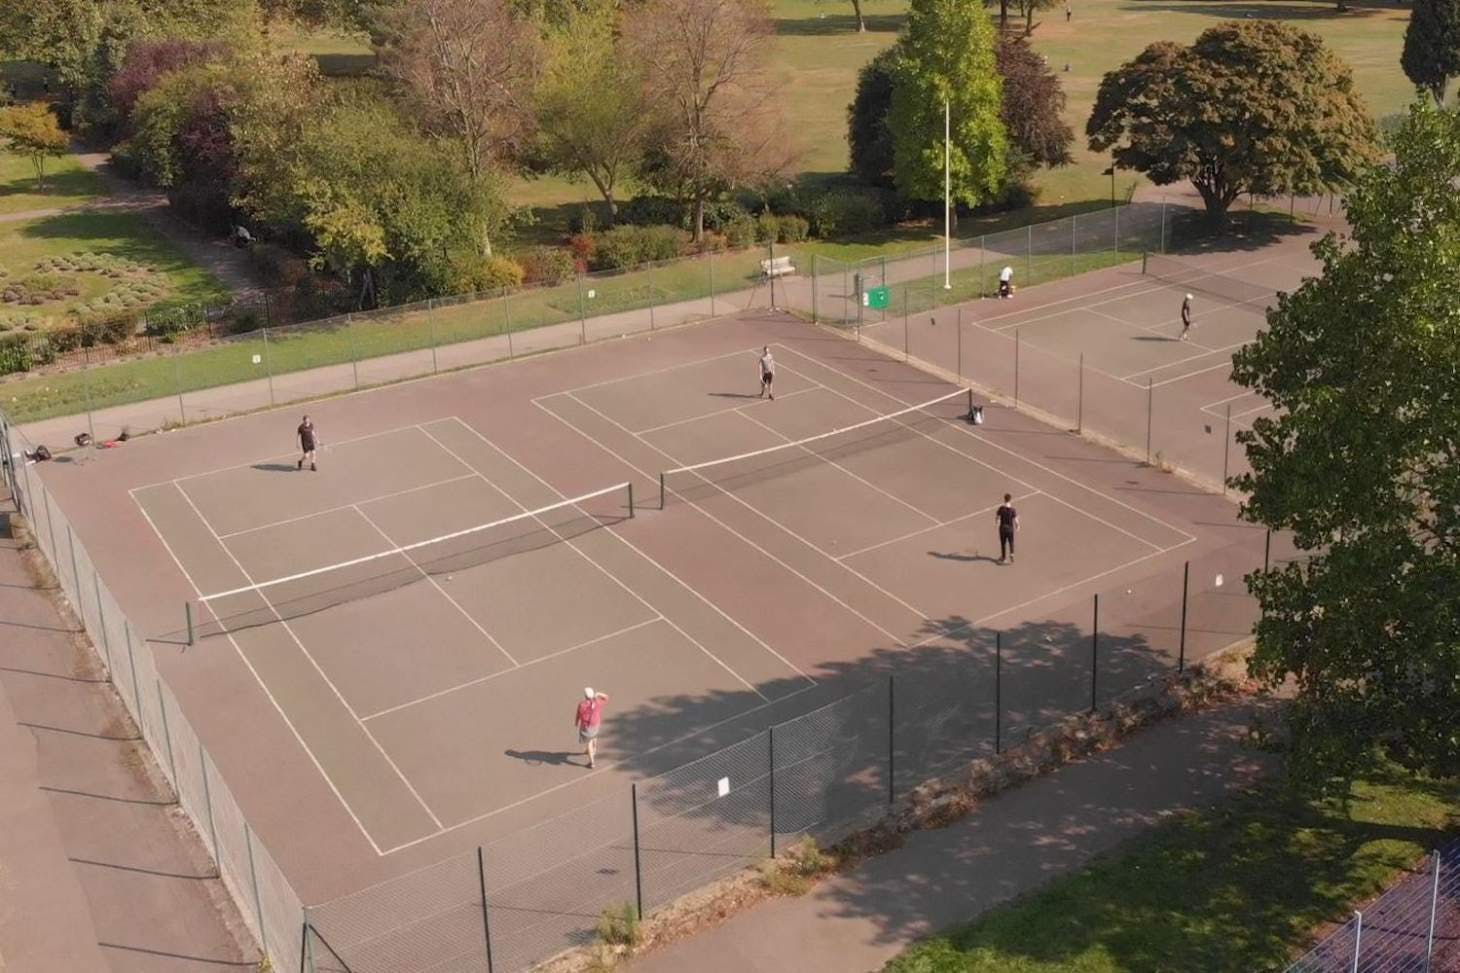 Hendon Park Outdoor   Hard (macadam) tennis court